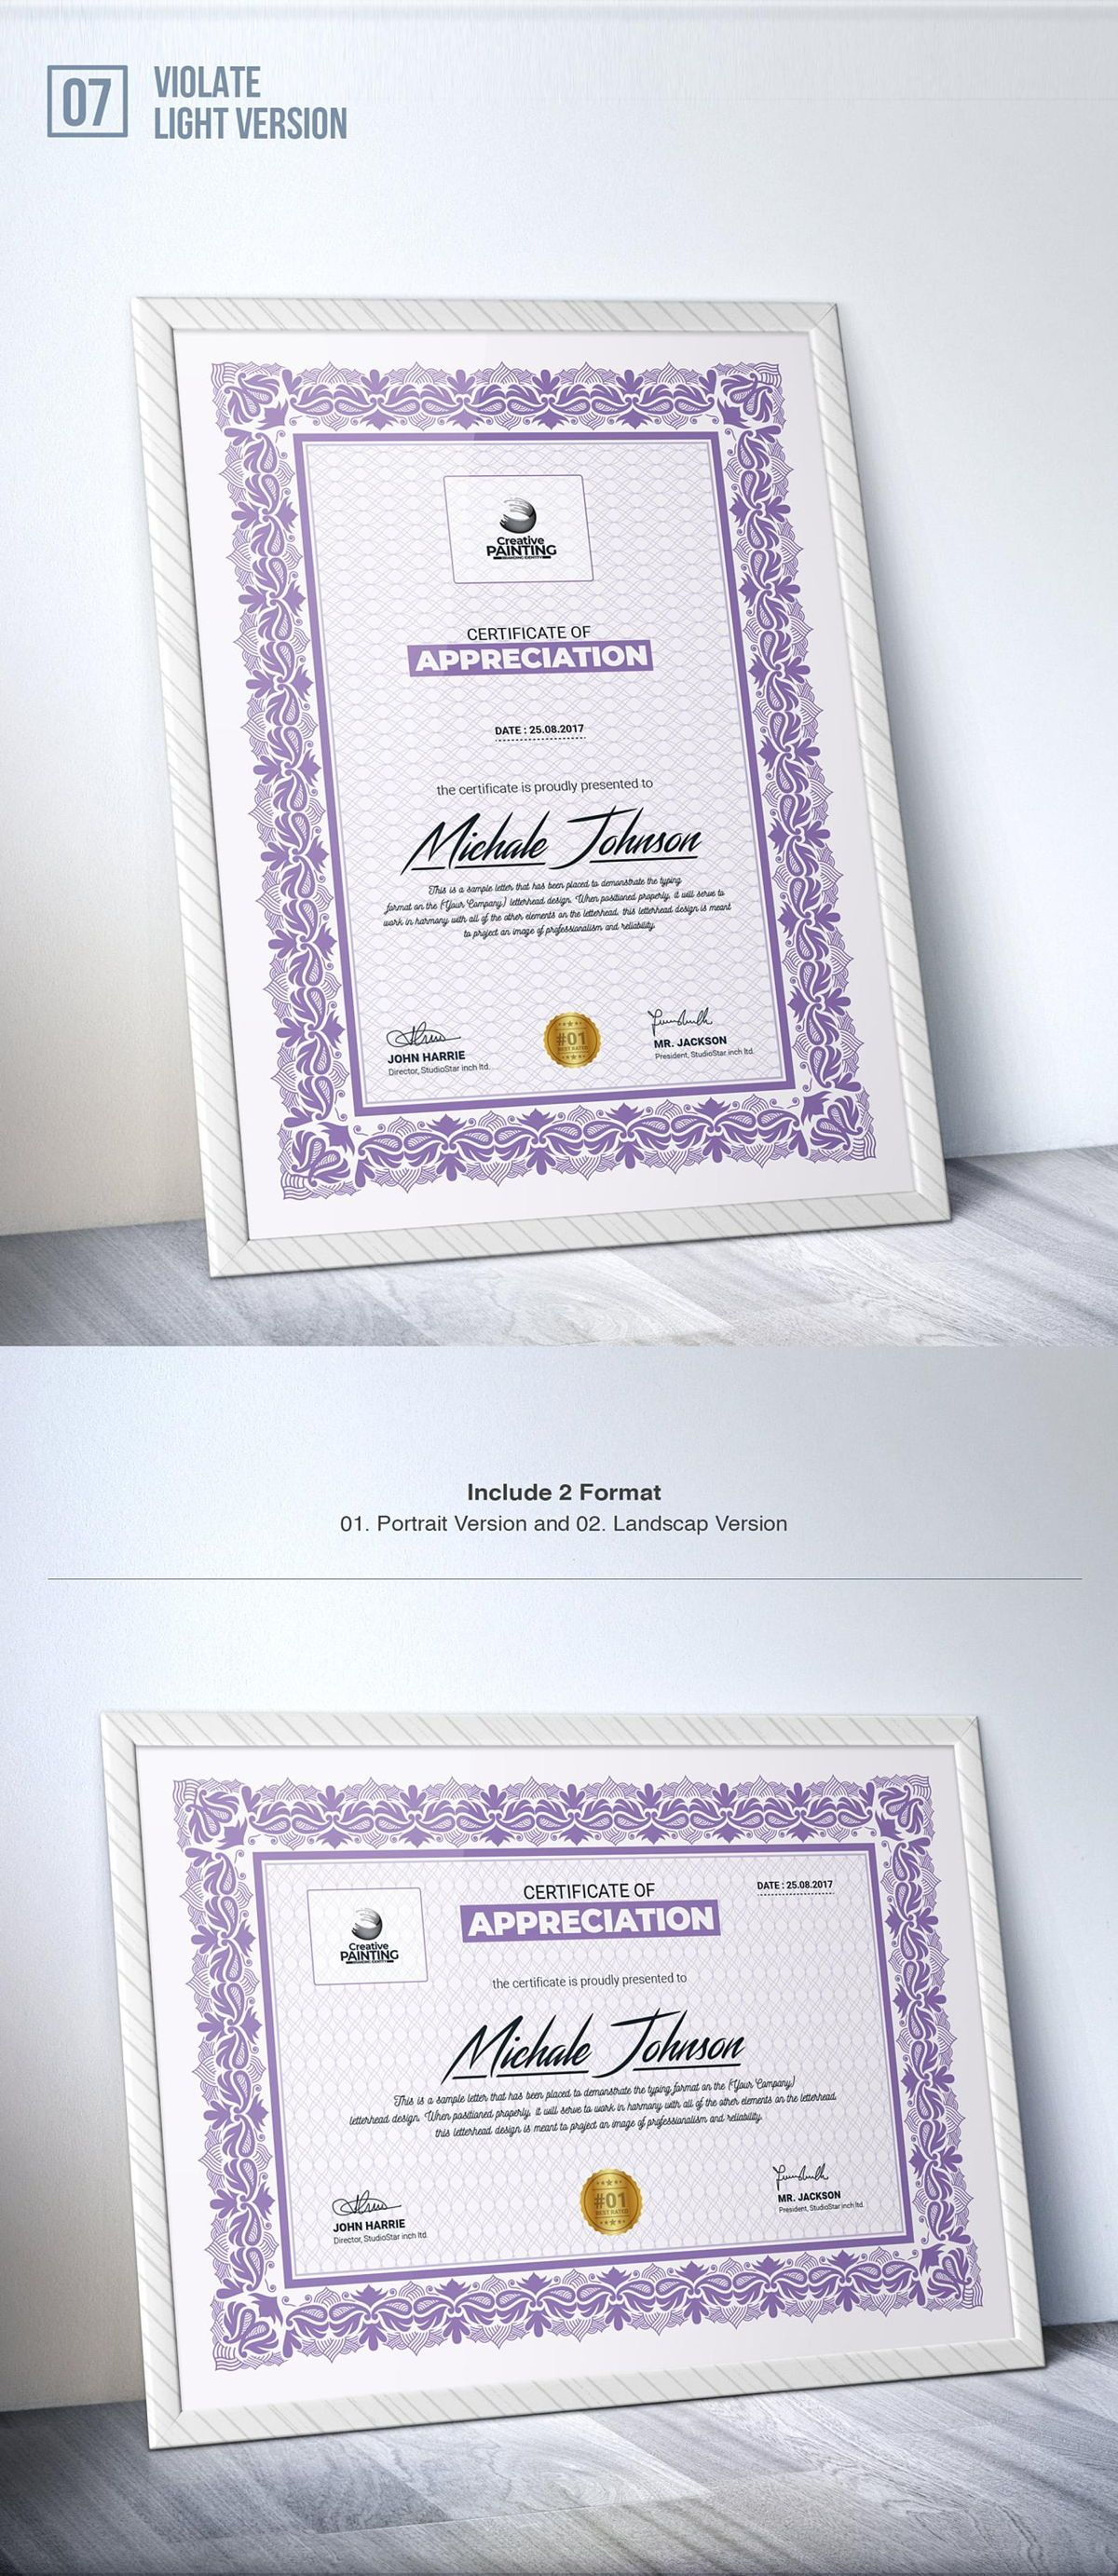 Creative Painting Certificate - 8 Colors - Dark and Light Version, Slide 9, 08755, Business — PoweredTemplate.com